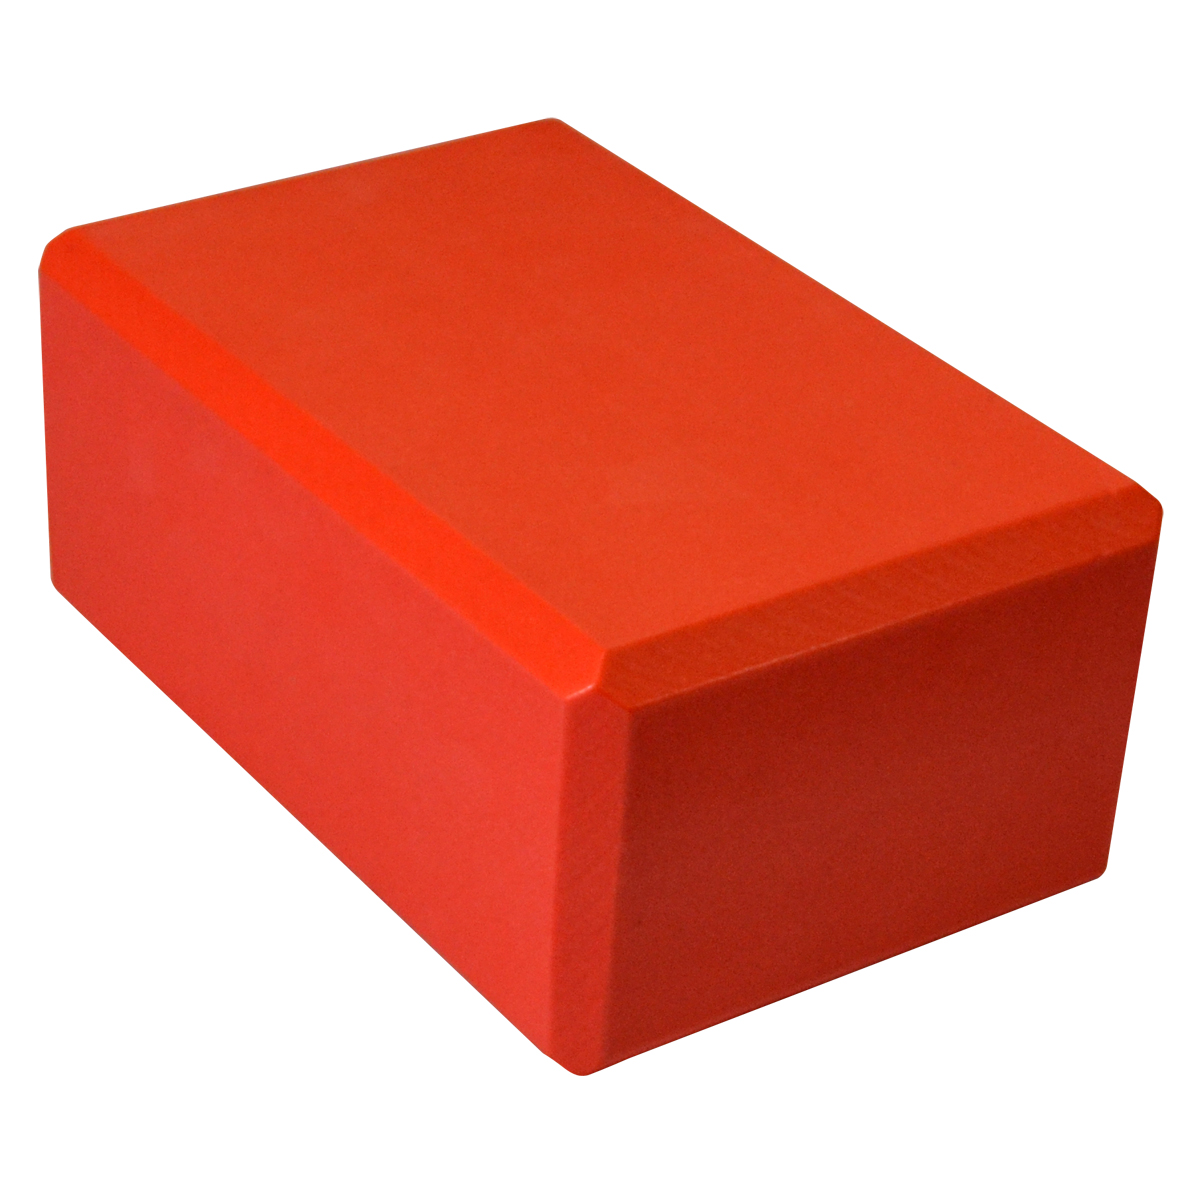 "Buy Yoga Blocks London: Foam Yoga Block 4"" X 6"" X 9"""